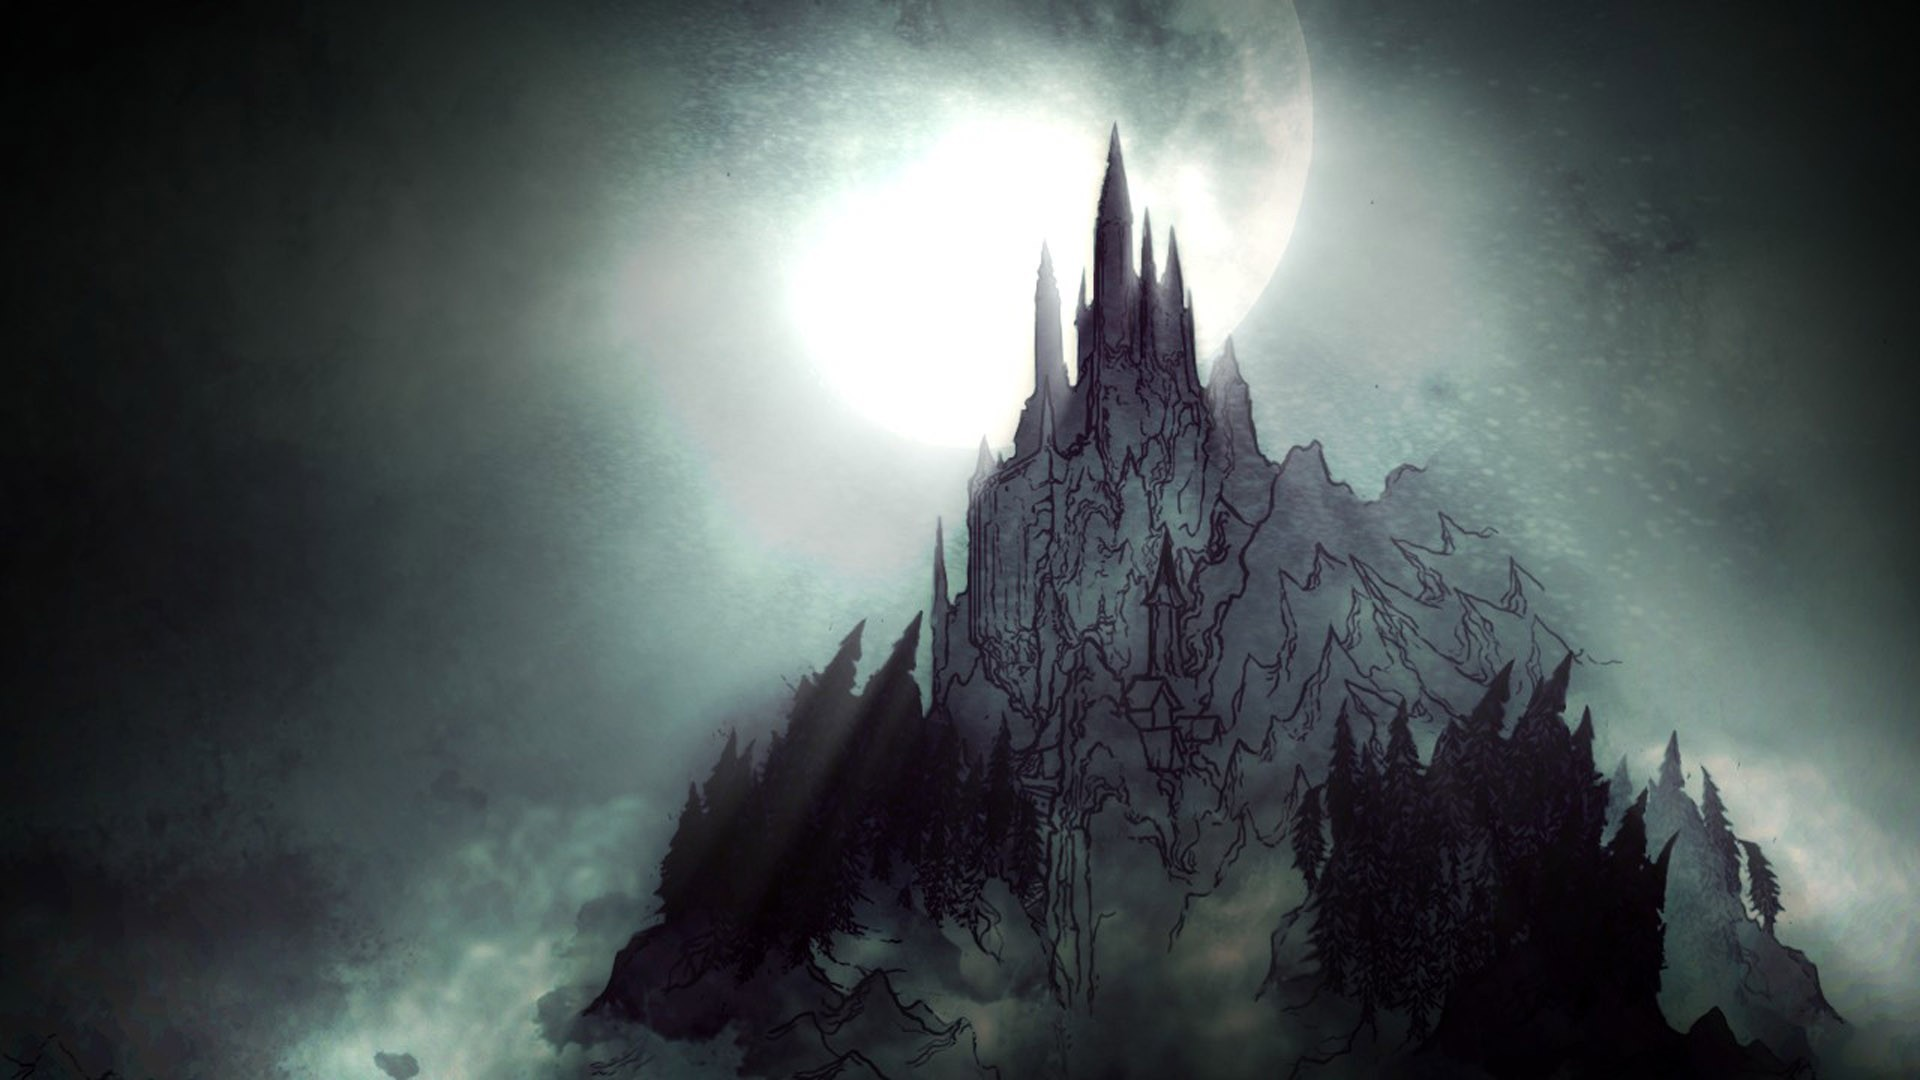 Res: 1920x1080, #video games, #retro games, #blood, #castle, #Dracula, #Castlevania,  wallpaper